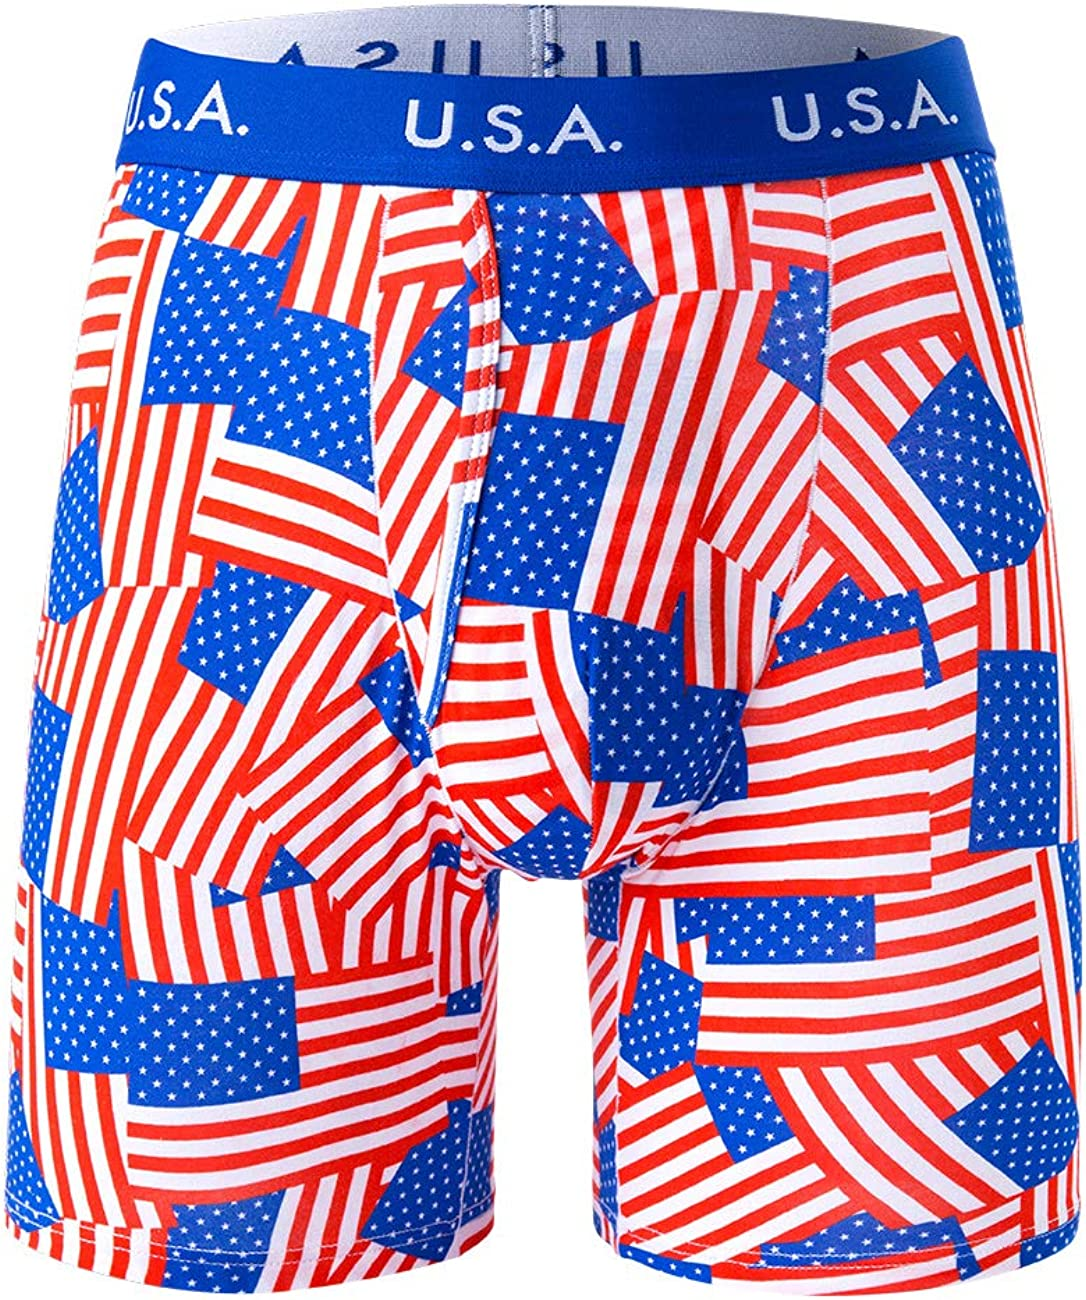 PLUMS Underwear Co. Men's 3 Pack Boxer Brief